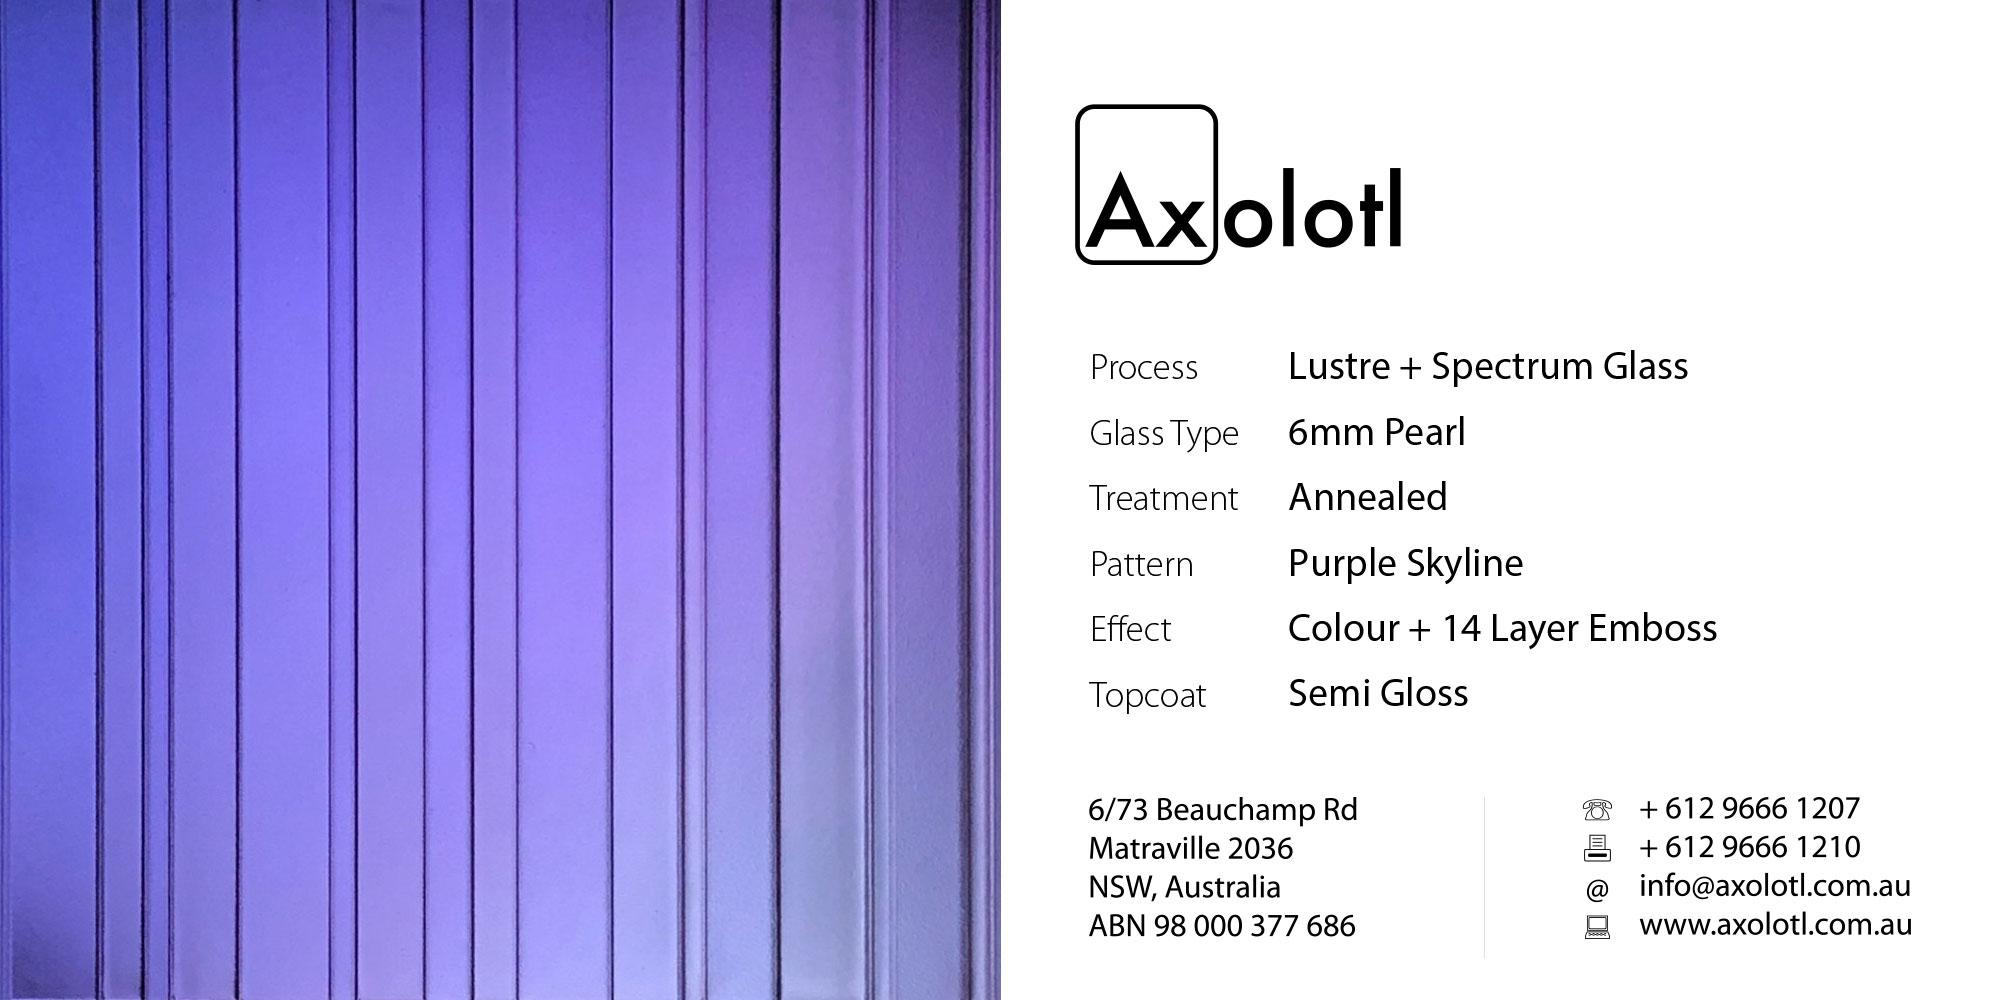 Axolotl_LustreSpectrum_PurpleSkyline.jpg